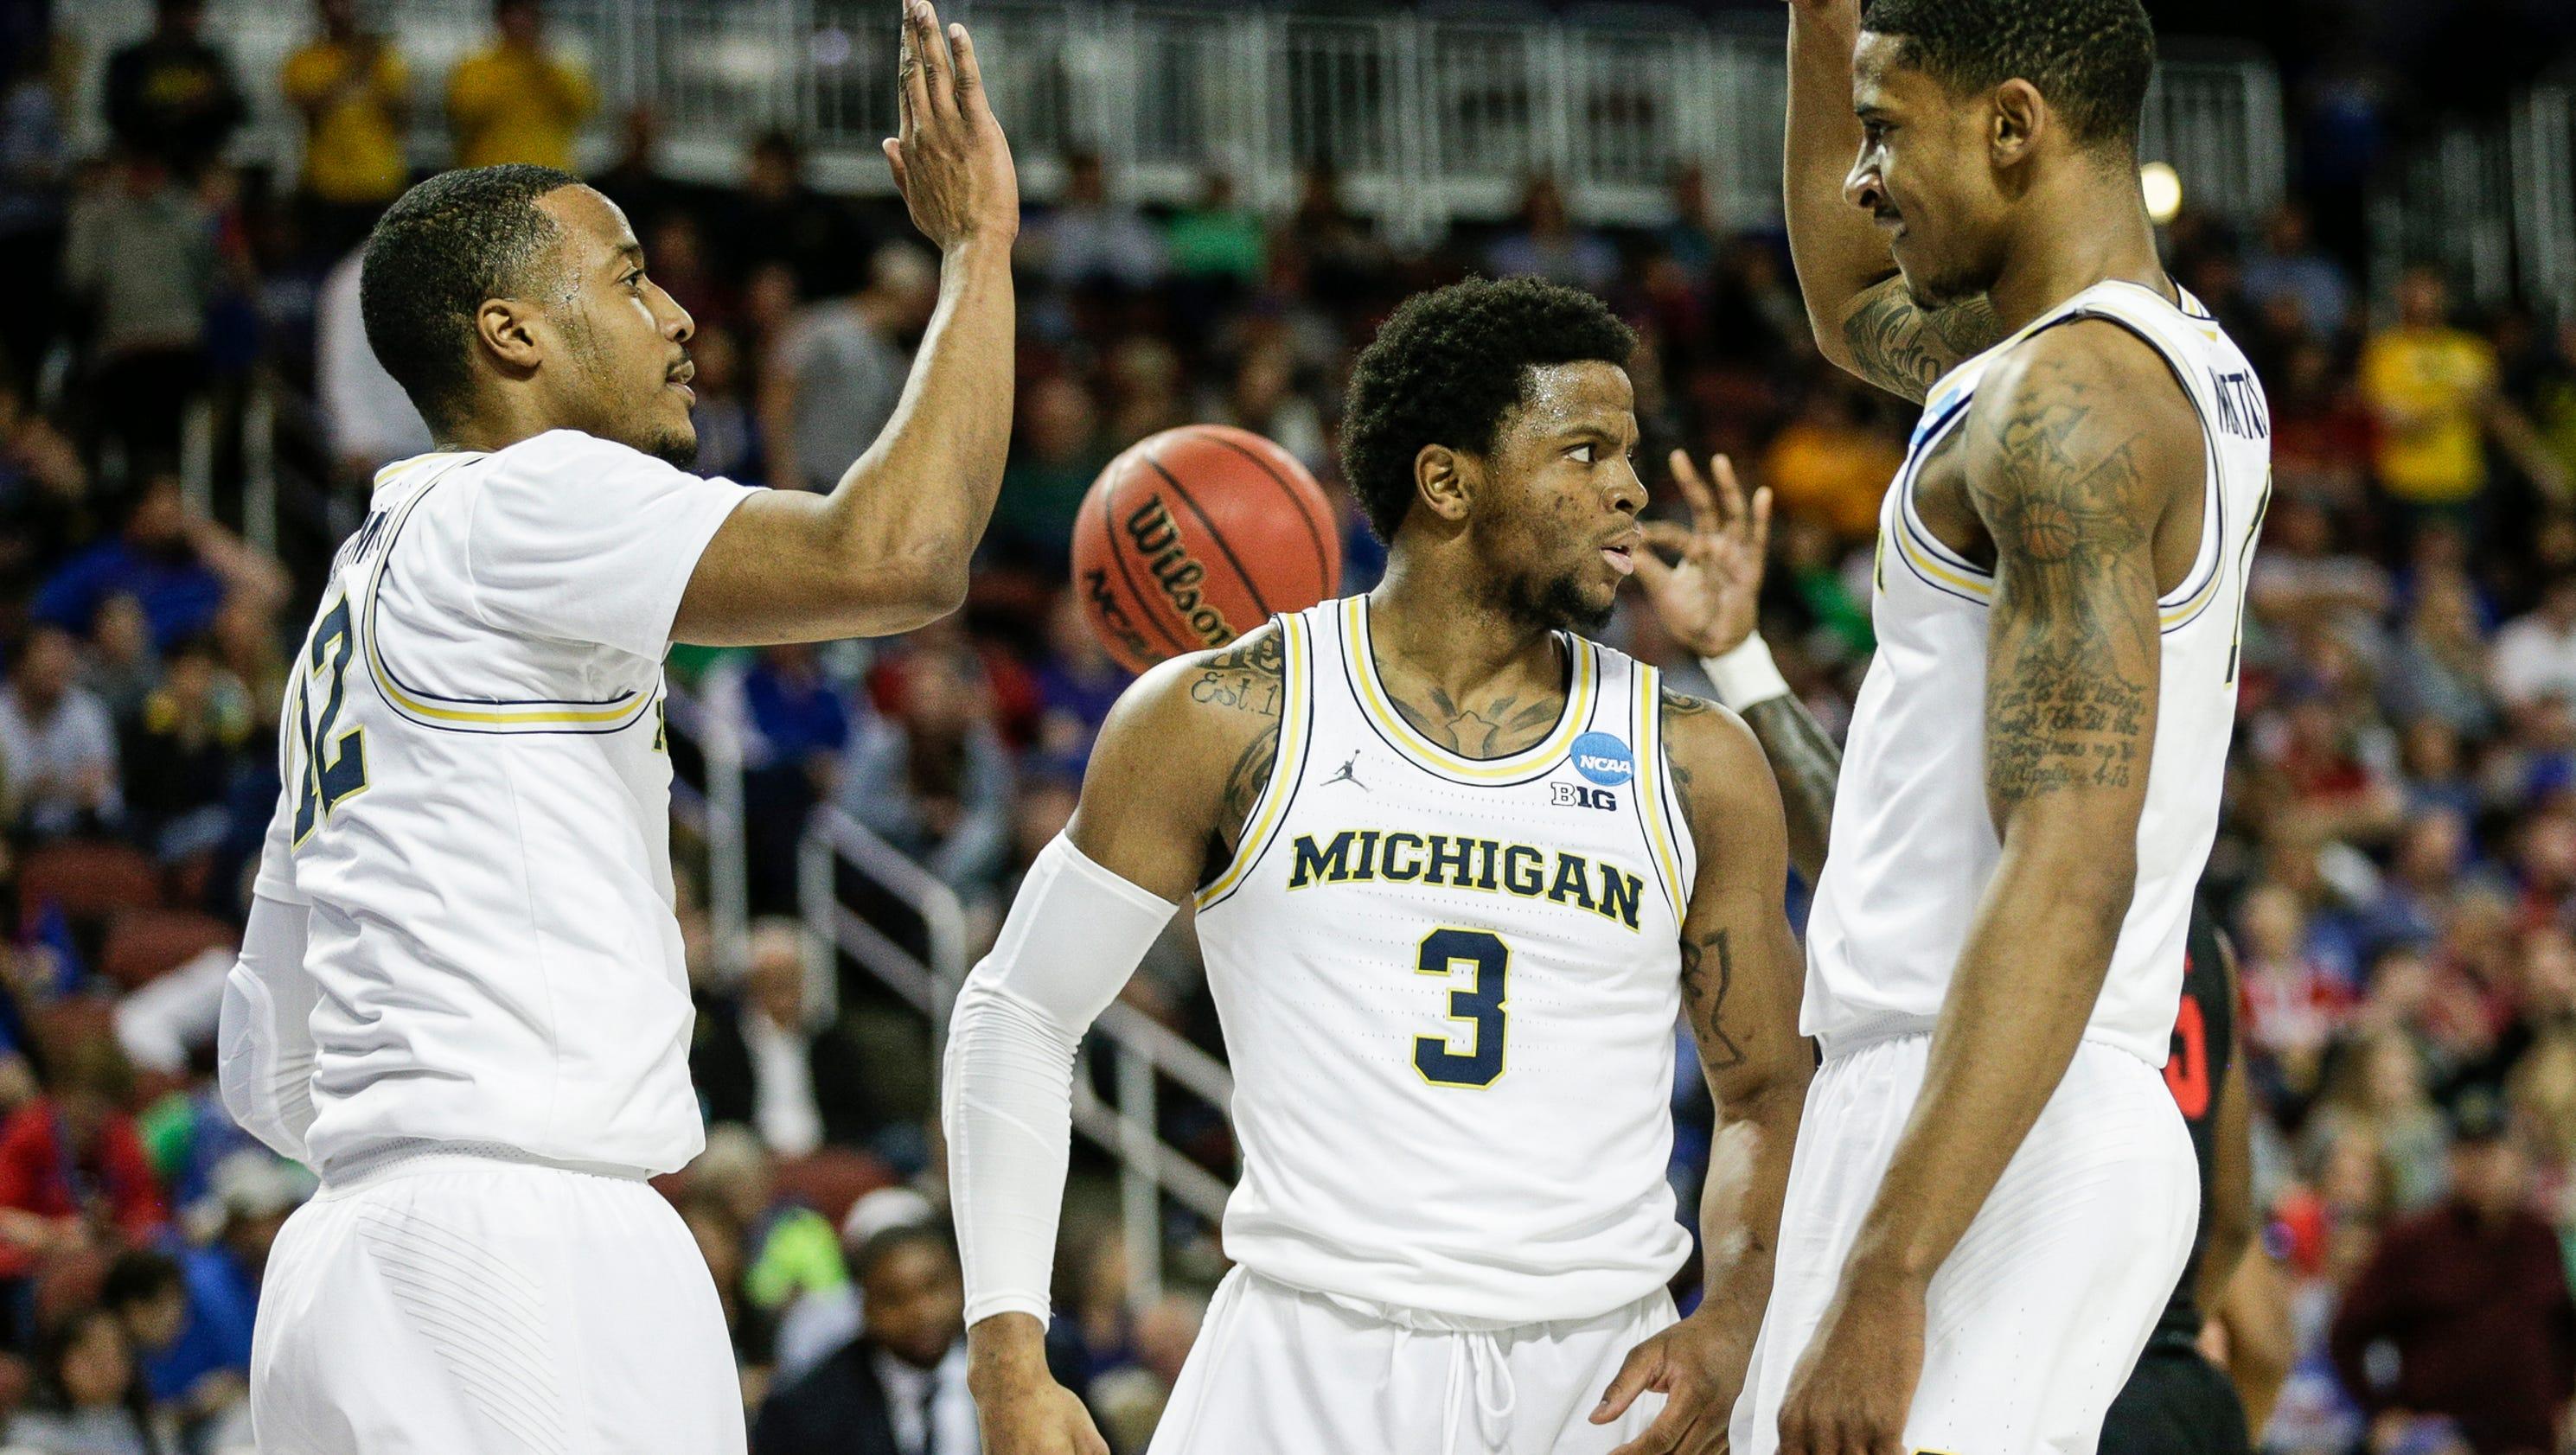 Michigan basketball 2nd-worst team in NCAA tournament: An ESPN take